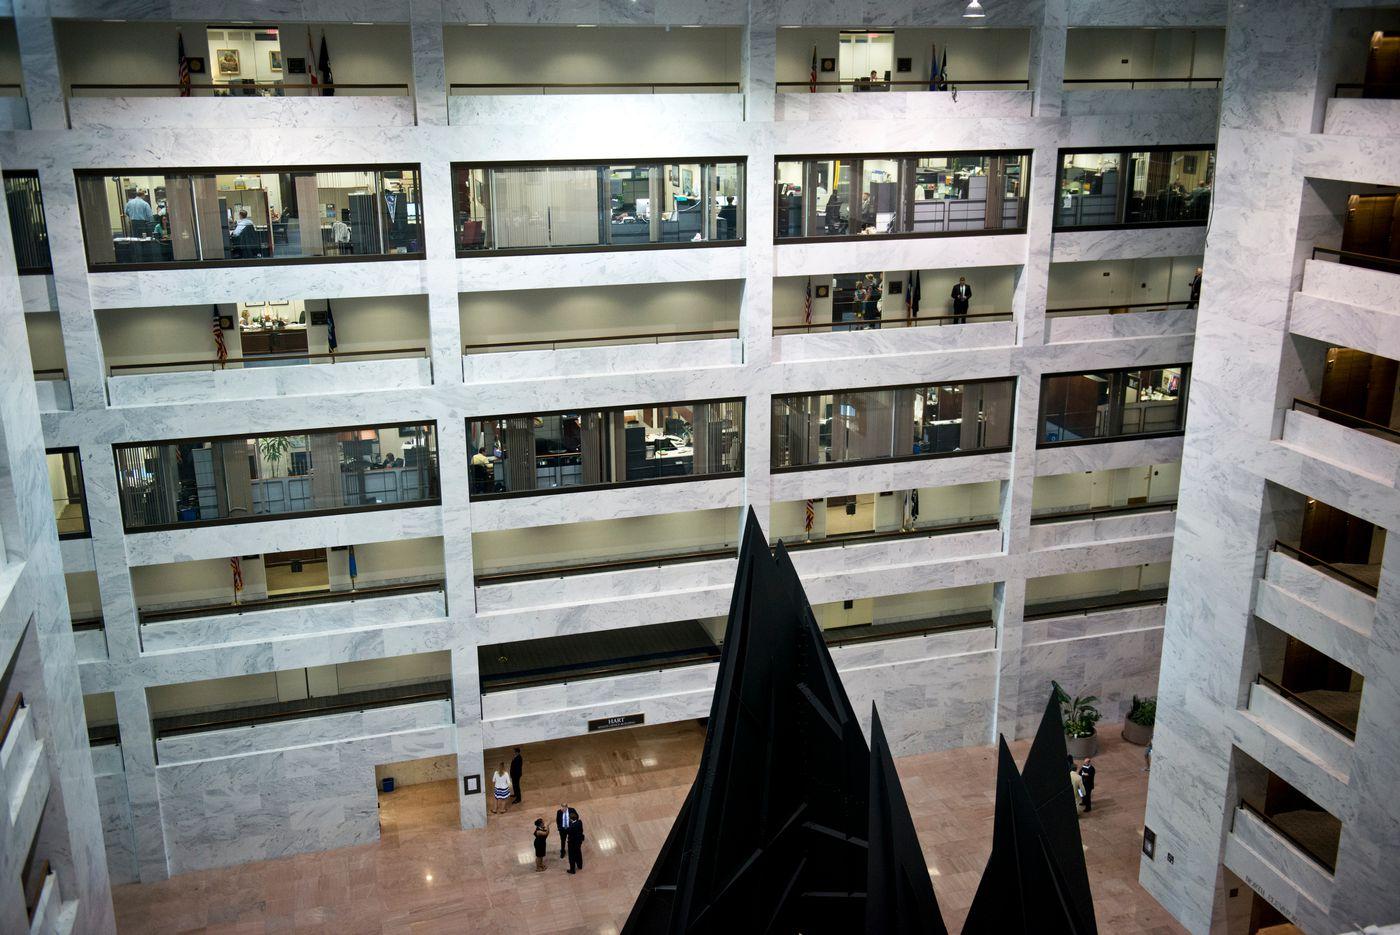 The Hart Senate Office Building houses both Sen. Lisa Murkowski and Sen. Dan Sullivan's offices. (Marc Lester / Alaska Dispatch News )